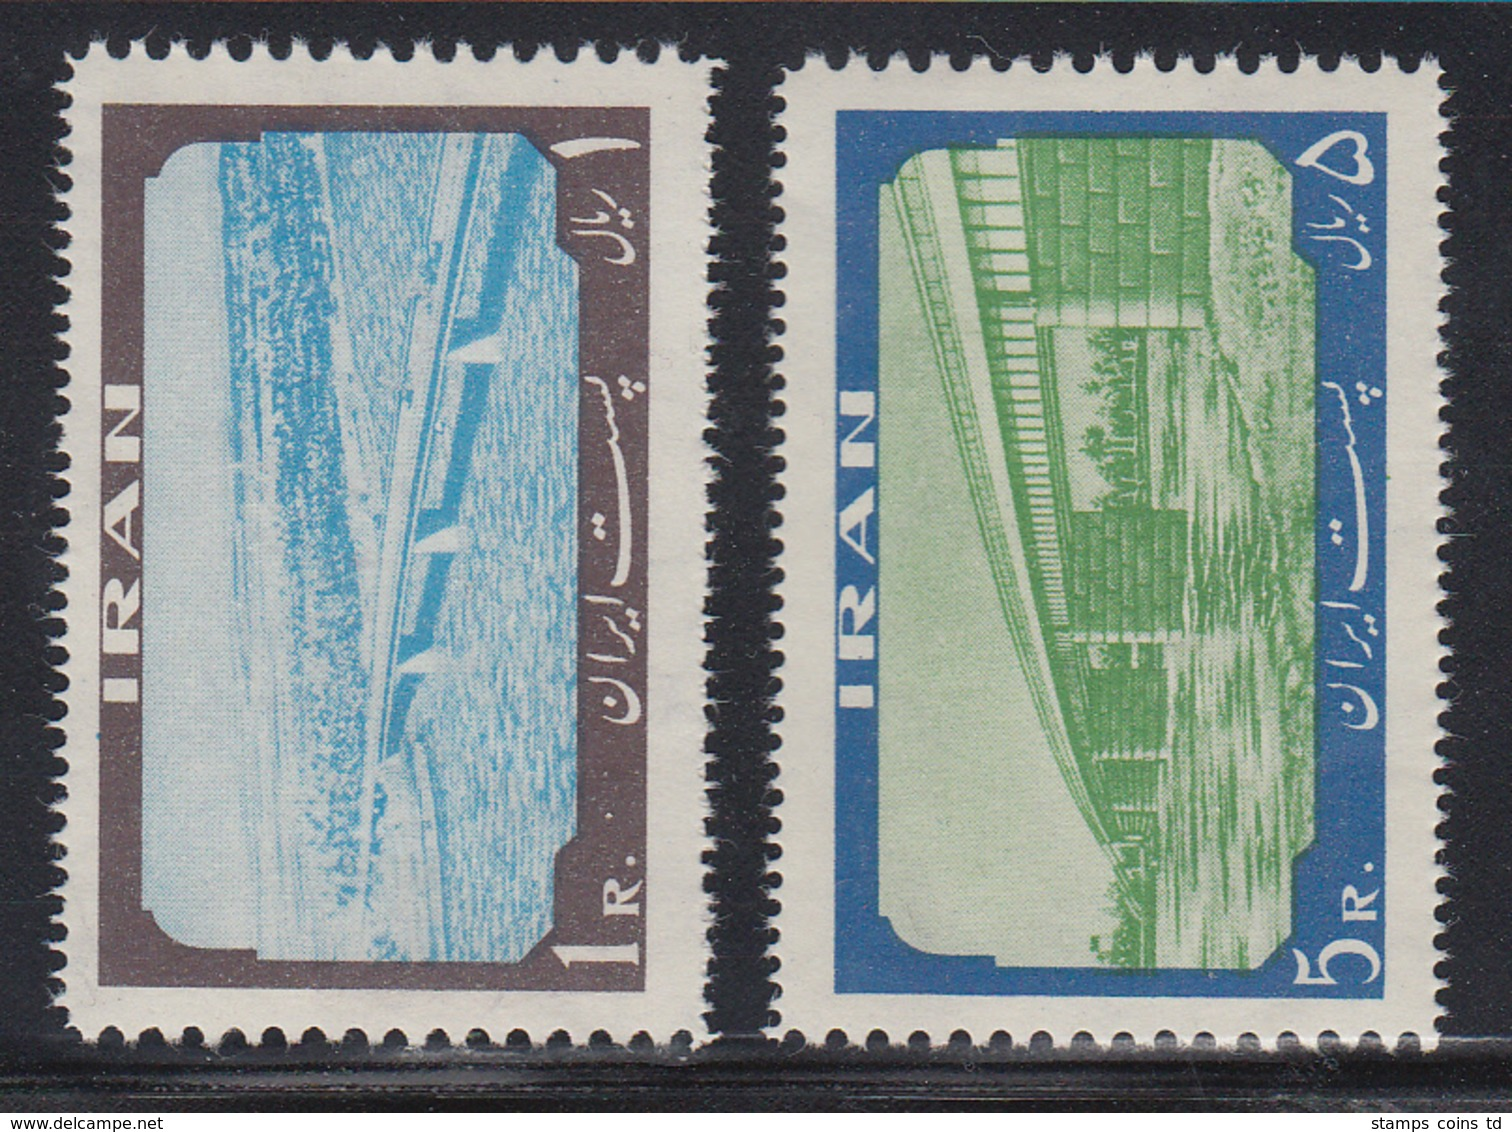 Persien / Iran 1960 Reza-Schah-Pahlavi-Brücke Khorramschar , Mi.-Nr. 1073-74 **  - Iran